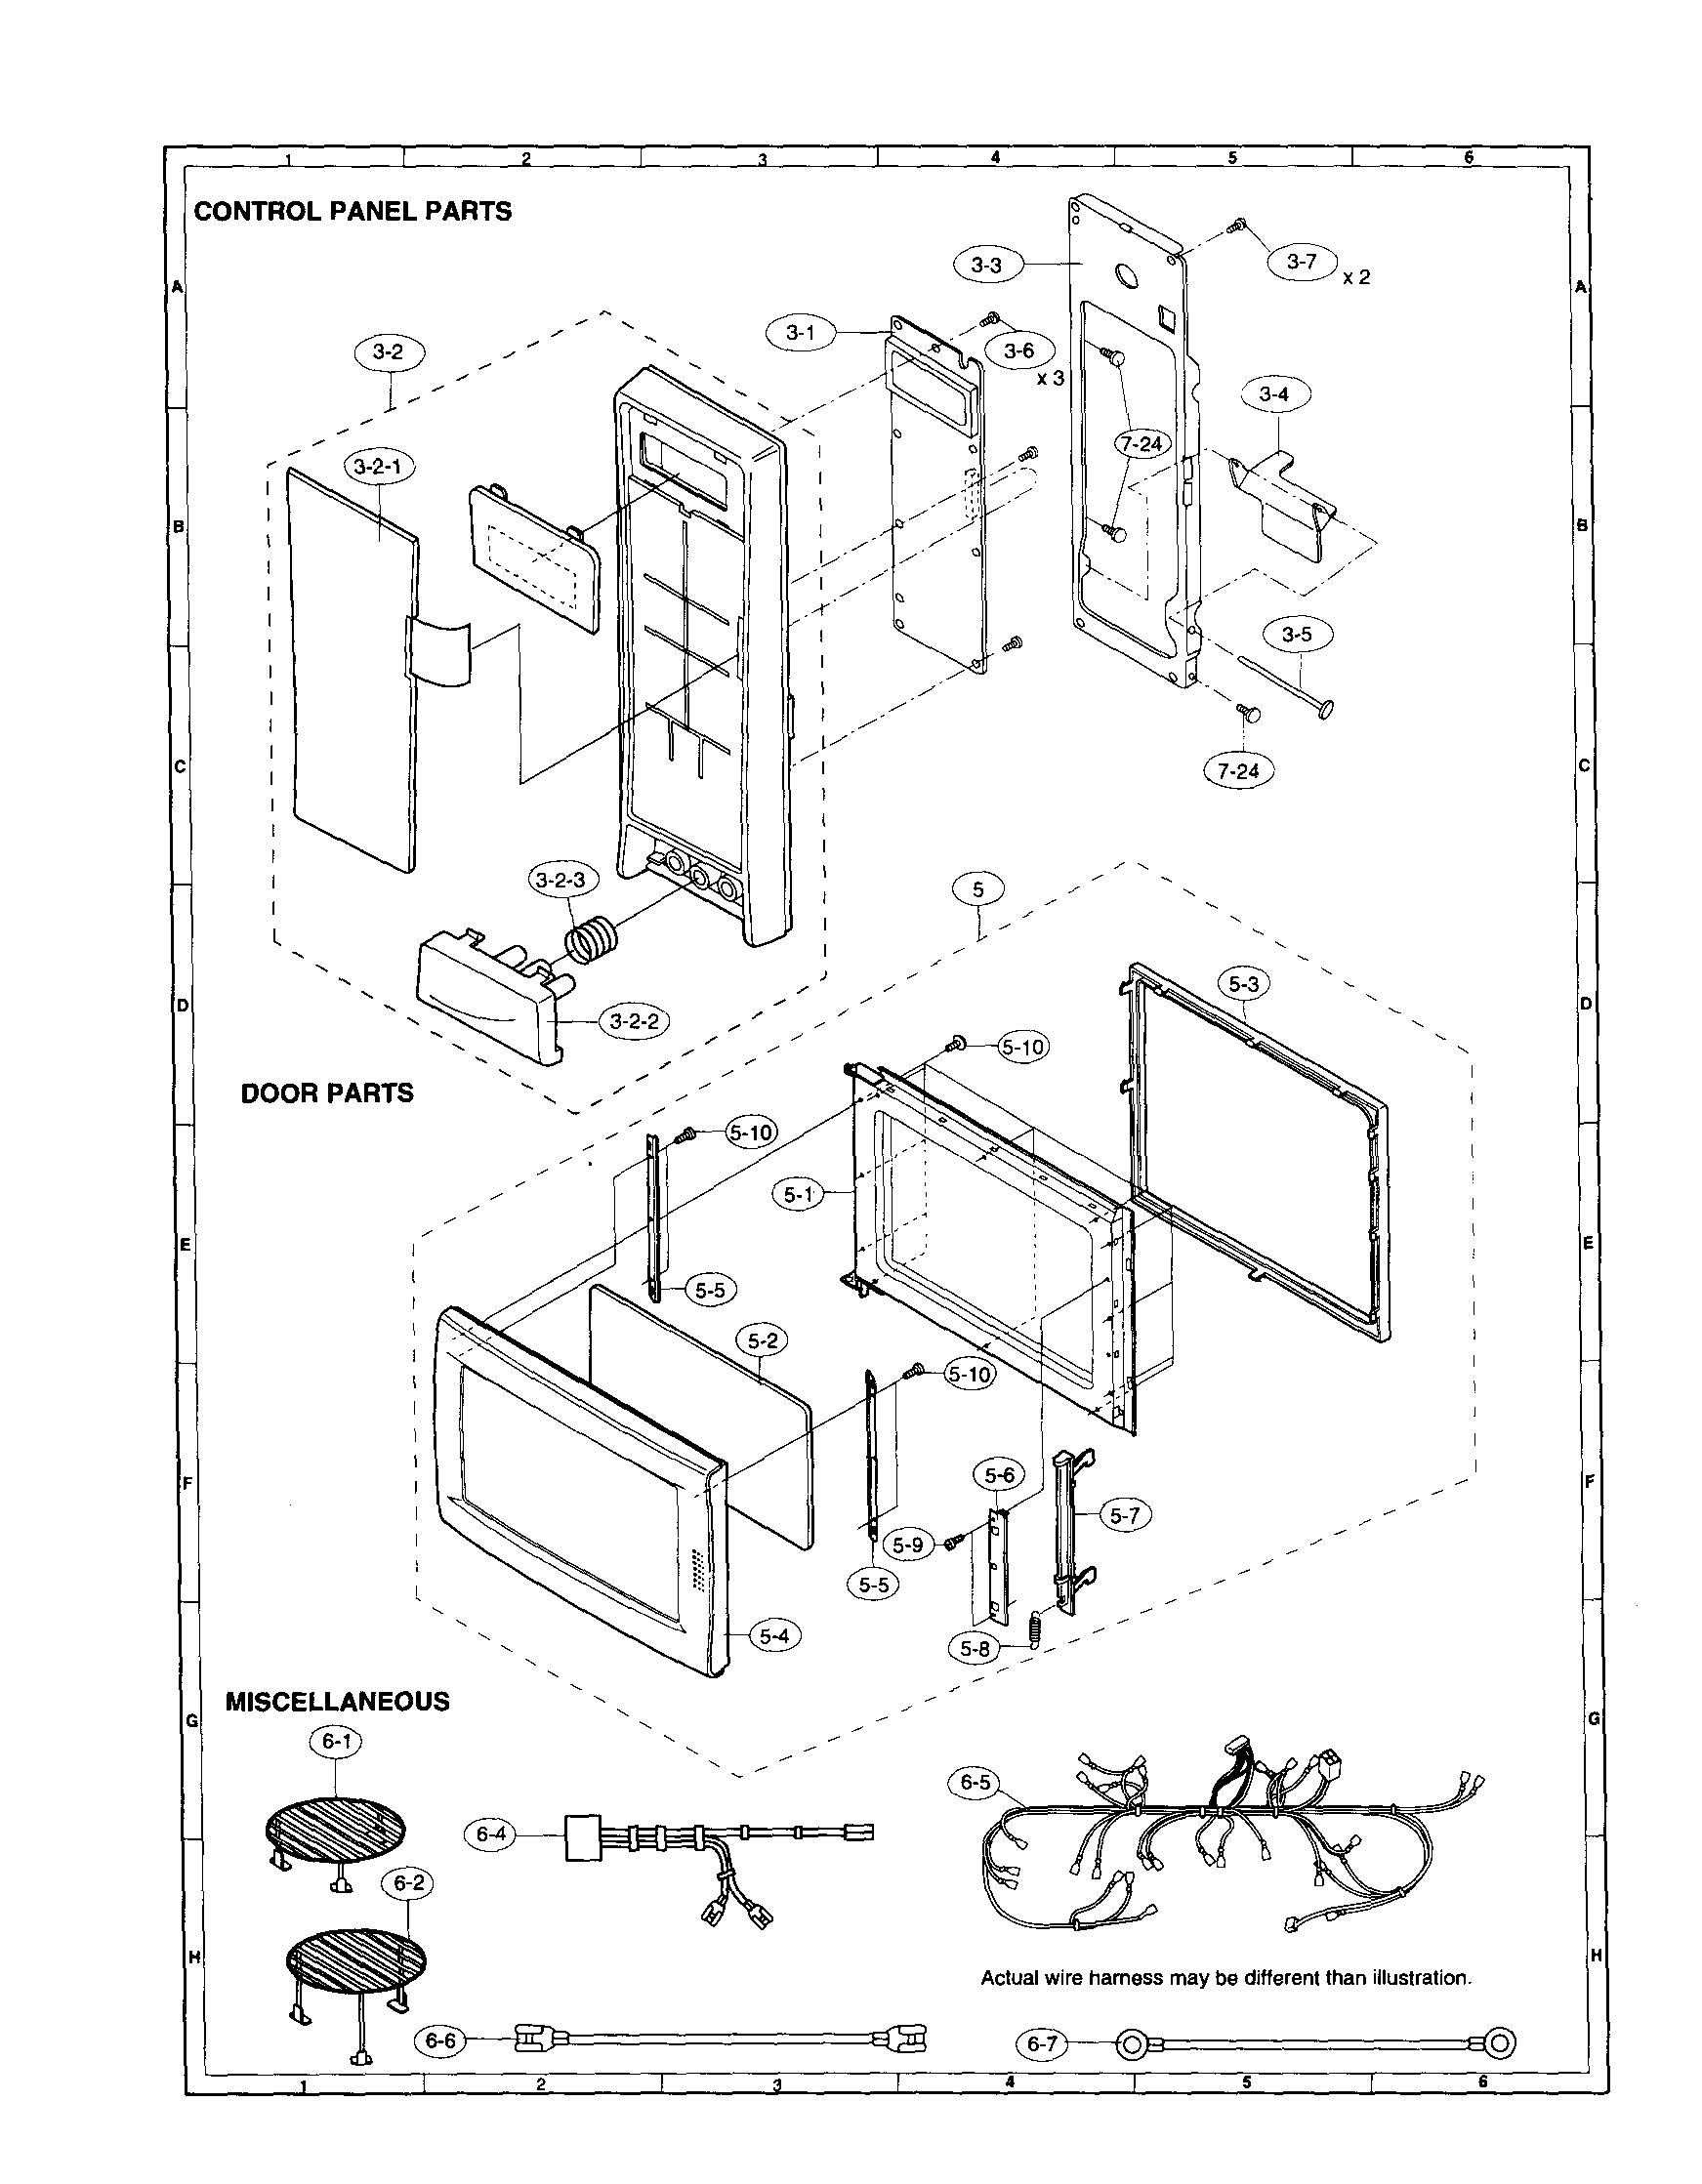 Sharp model R-930AK countertop microwave genuine parts